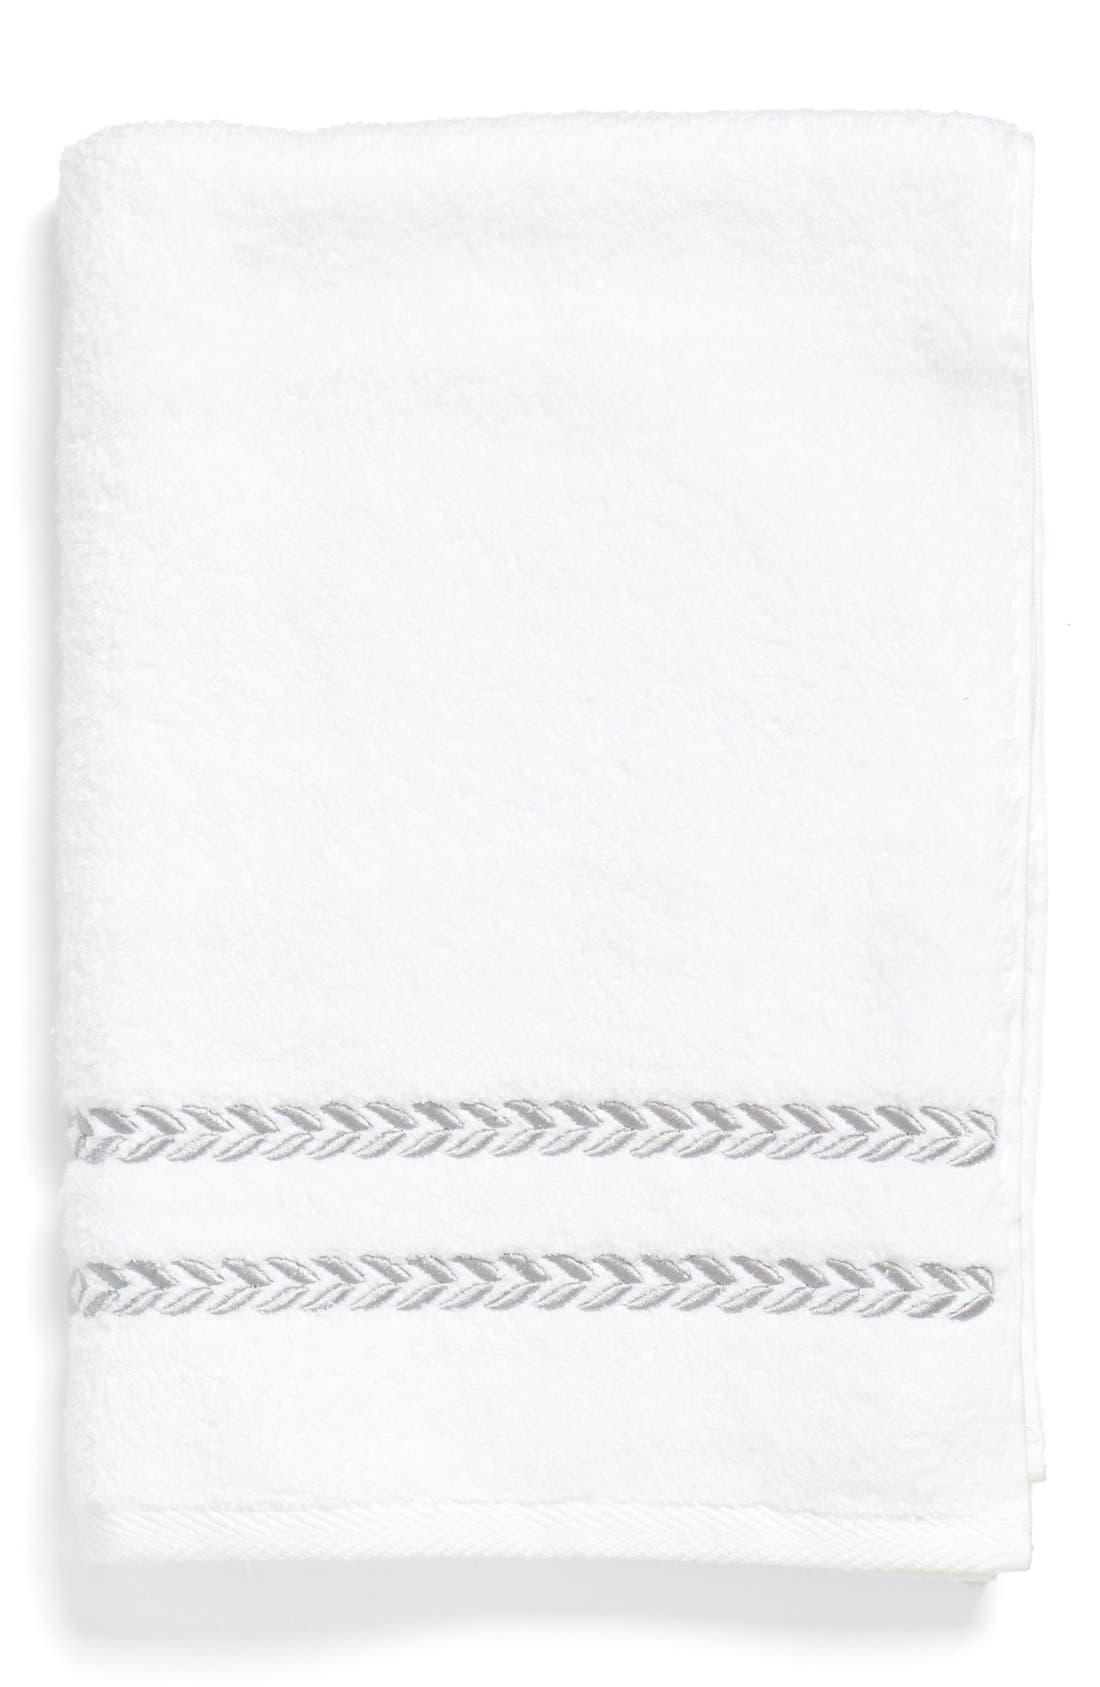 'Pearl Essence' Hand Towel,                         Main,                         color, White/ Smoke